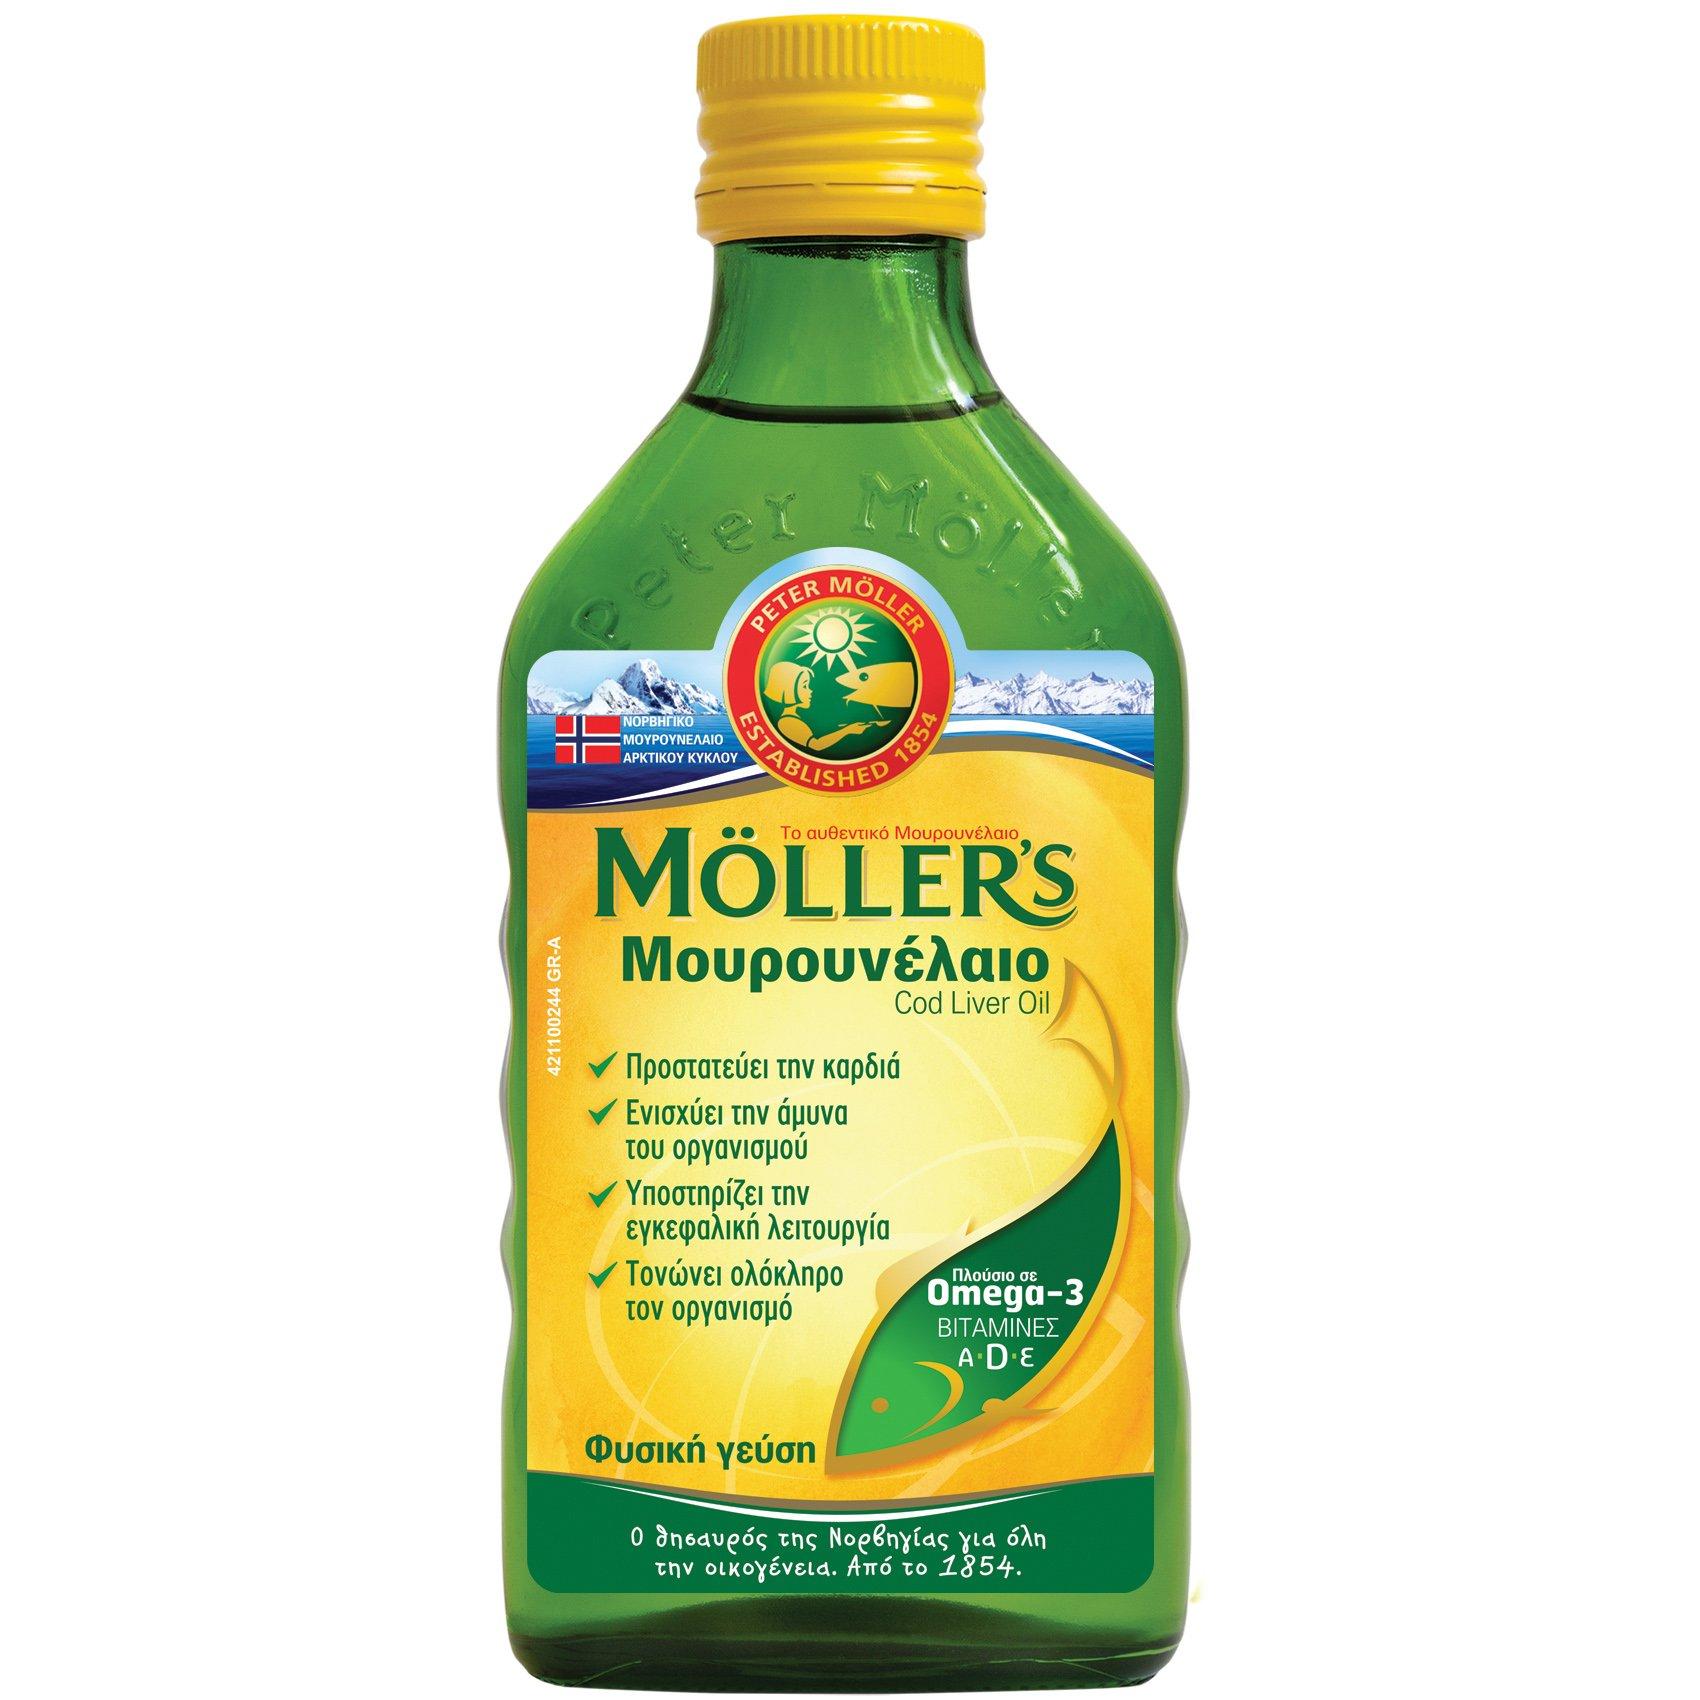 Moller's Μουρουνέλαιο Φυσική Γεύση 250ml Ημ. Λήξης 09/2020,Πόσιμο Μουρουνέλαιο Πλούσιο σε Ωμέγα-3 με Βιταμίνες A,D & E για Φυσικ